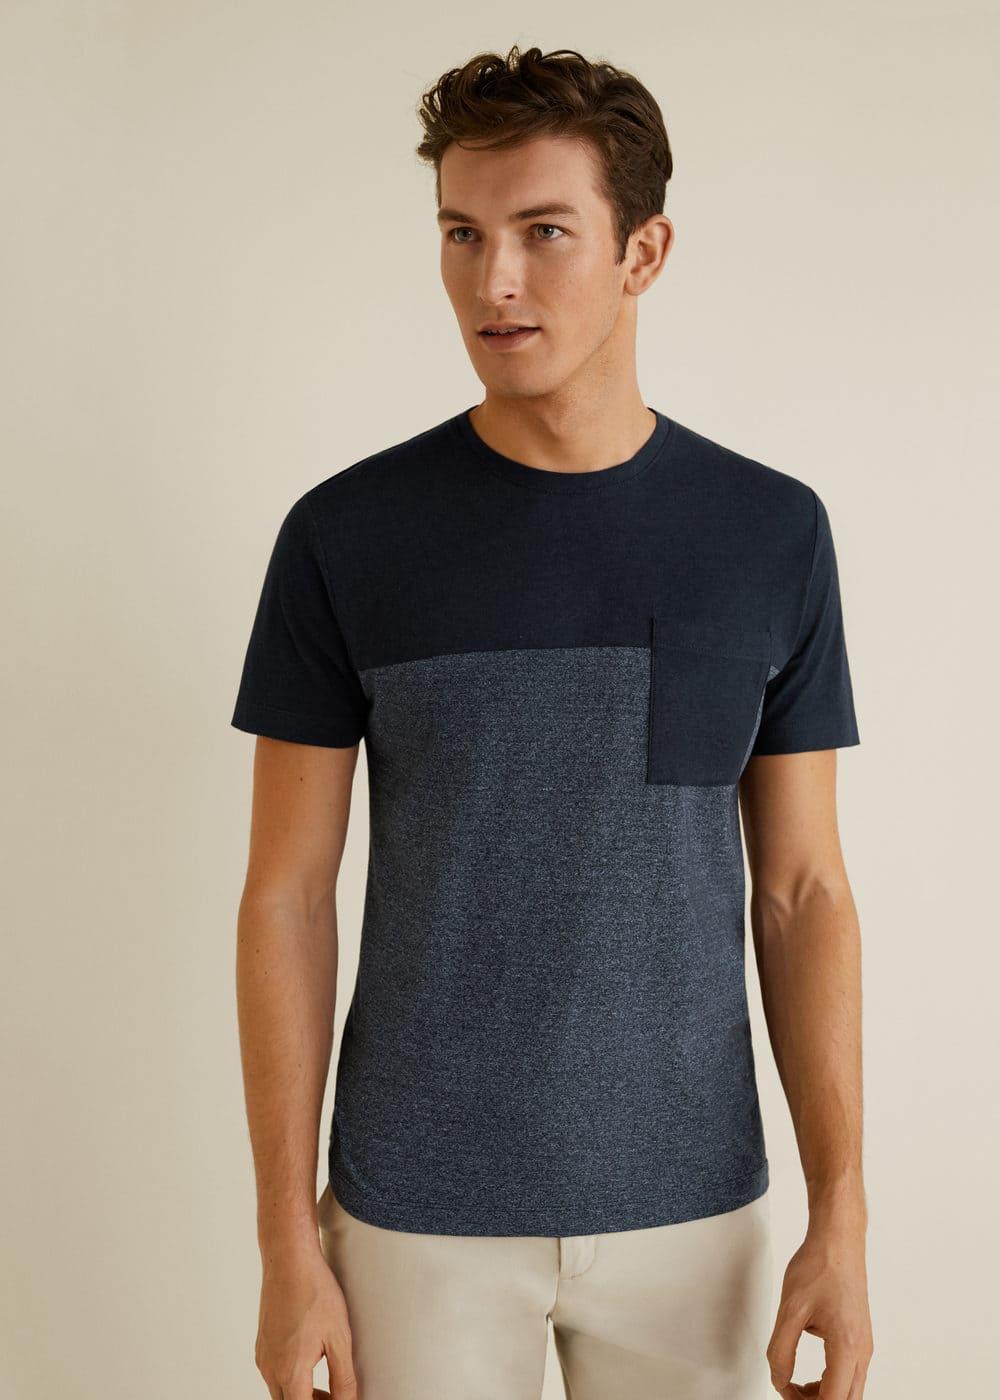 Mango - Camiseta combinada bolsillo - 1